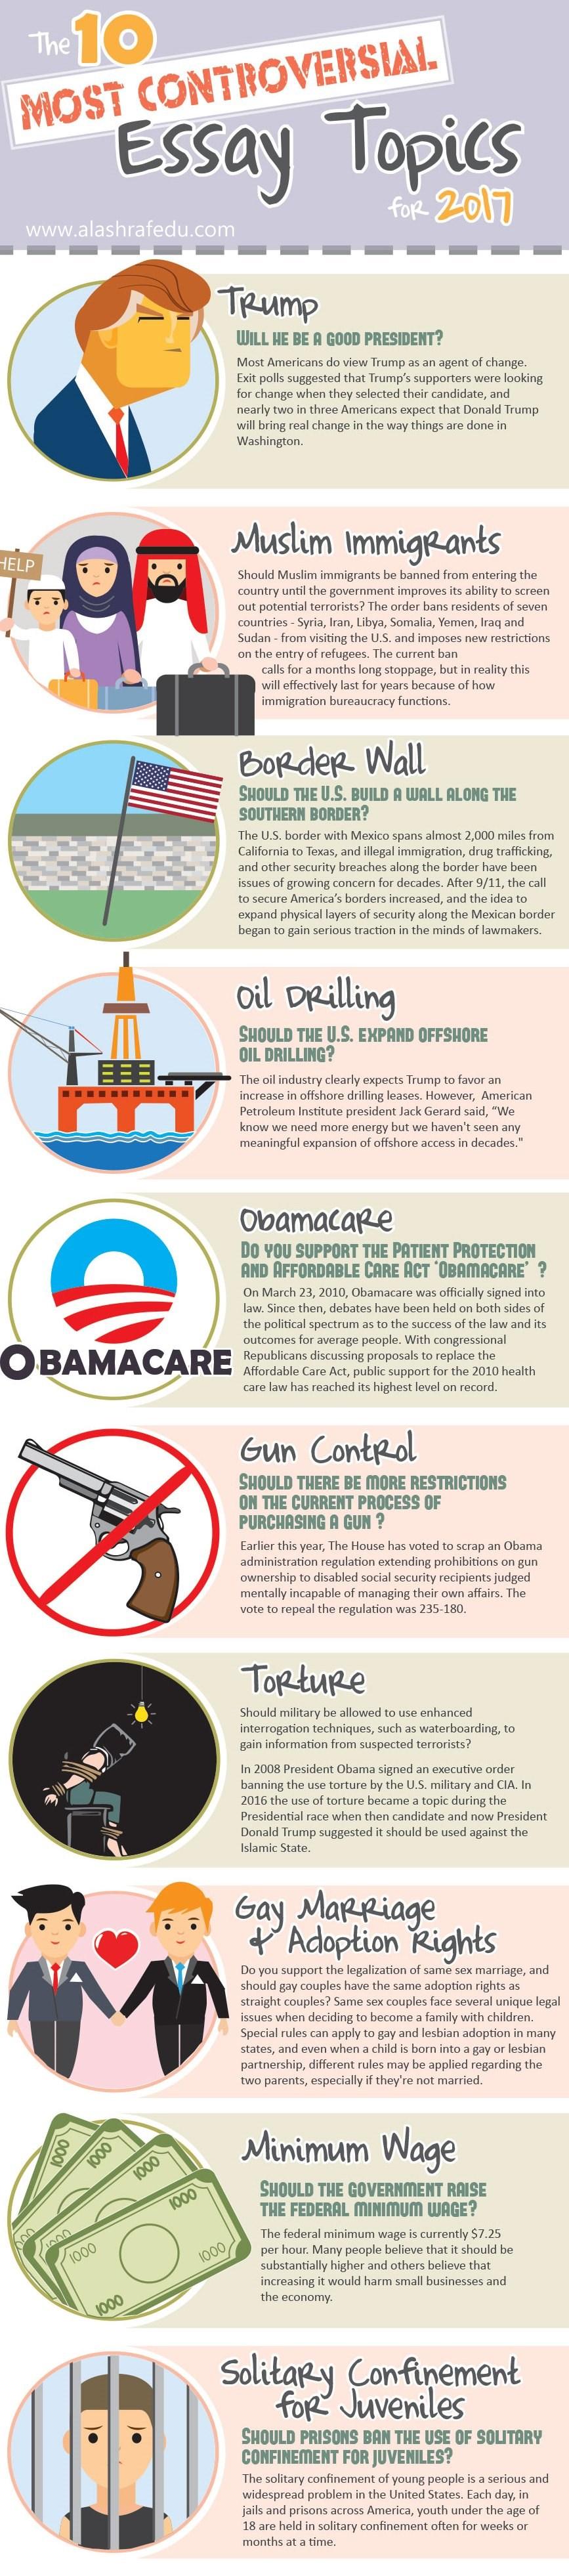 Infographic Most Controversial Essay Topics 2020 www.alashrafedu.com1